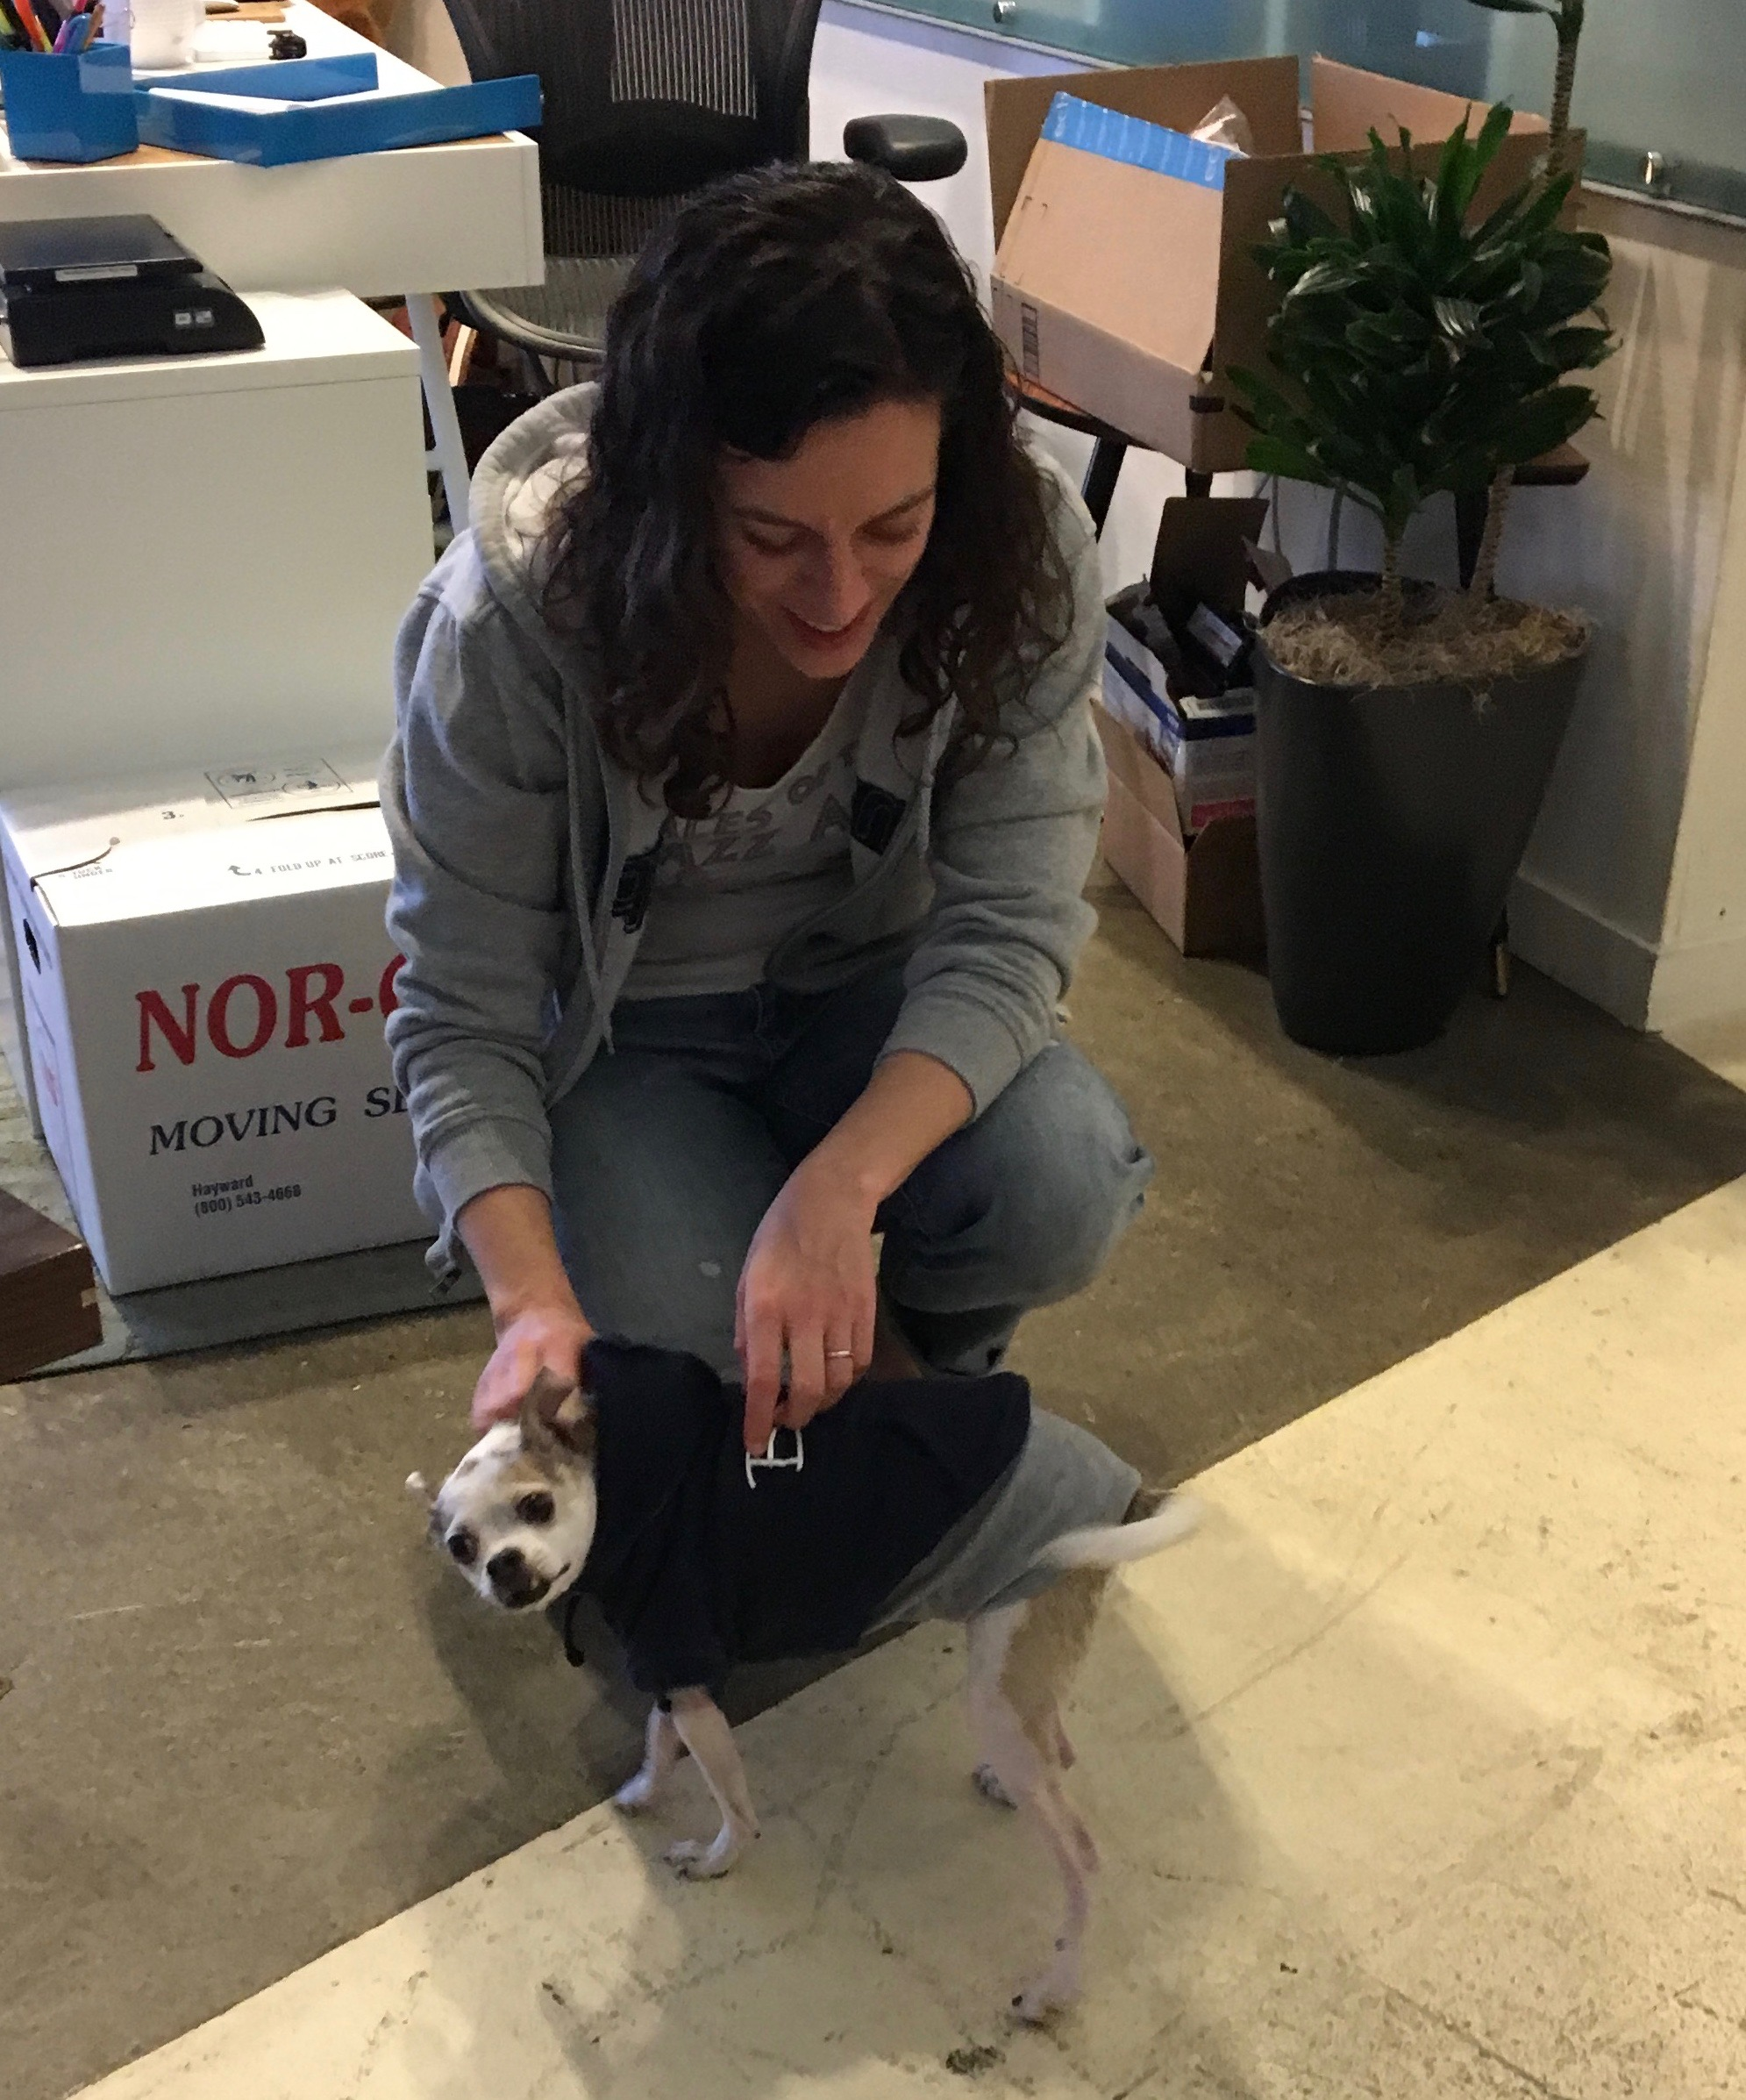 Woman In Sweatshirt Petting Chihuahua In Sweatshirt